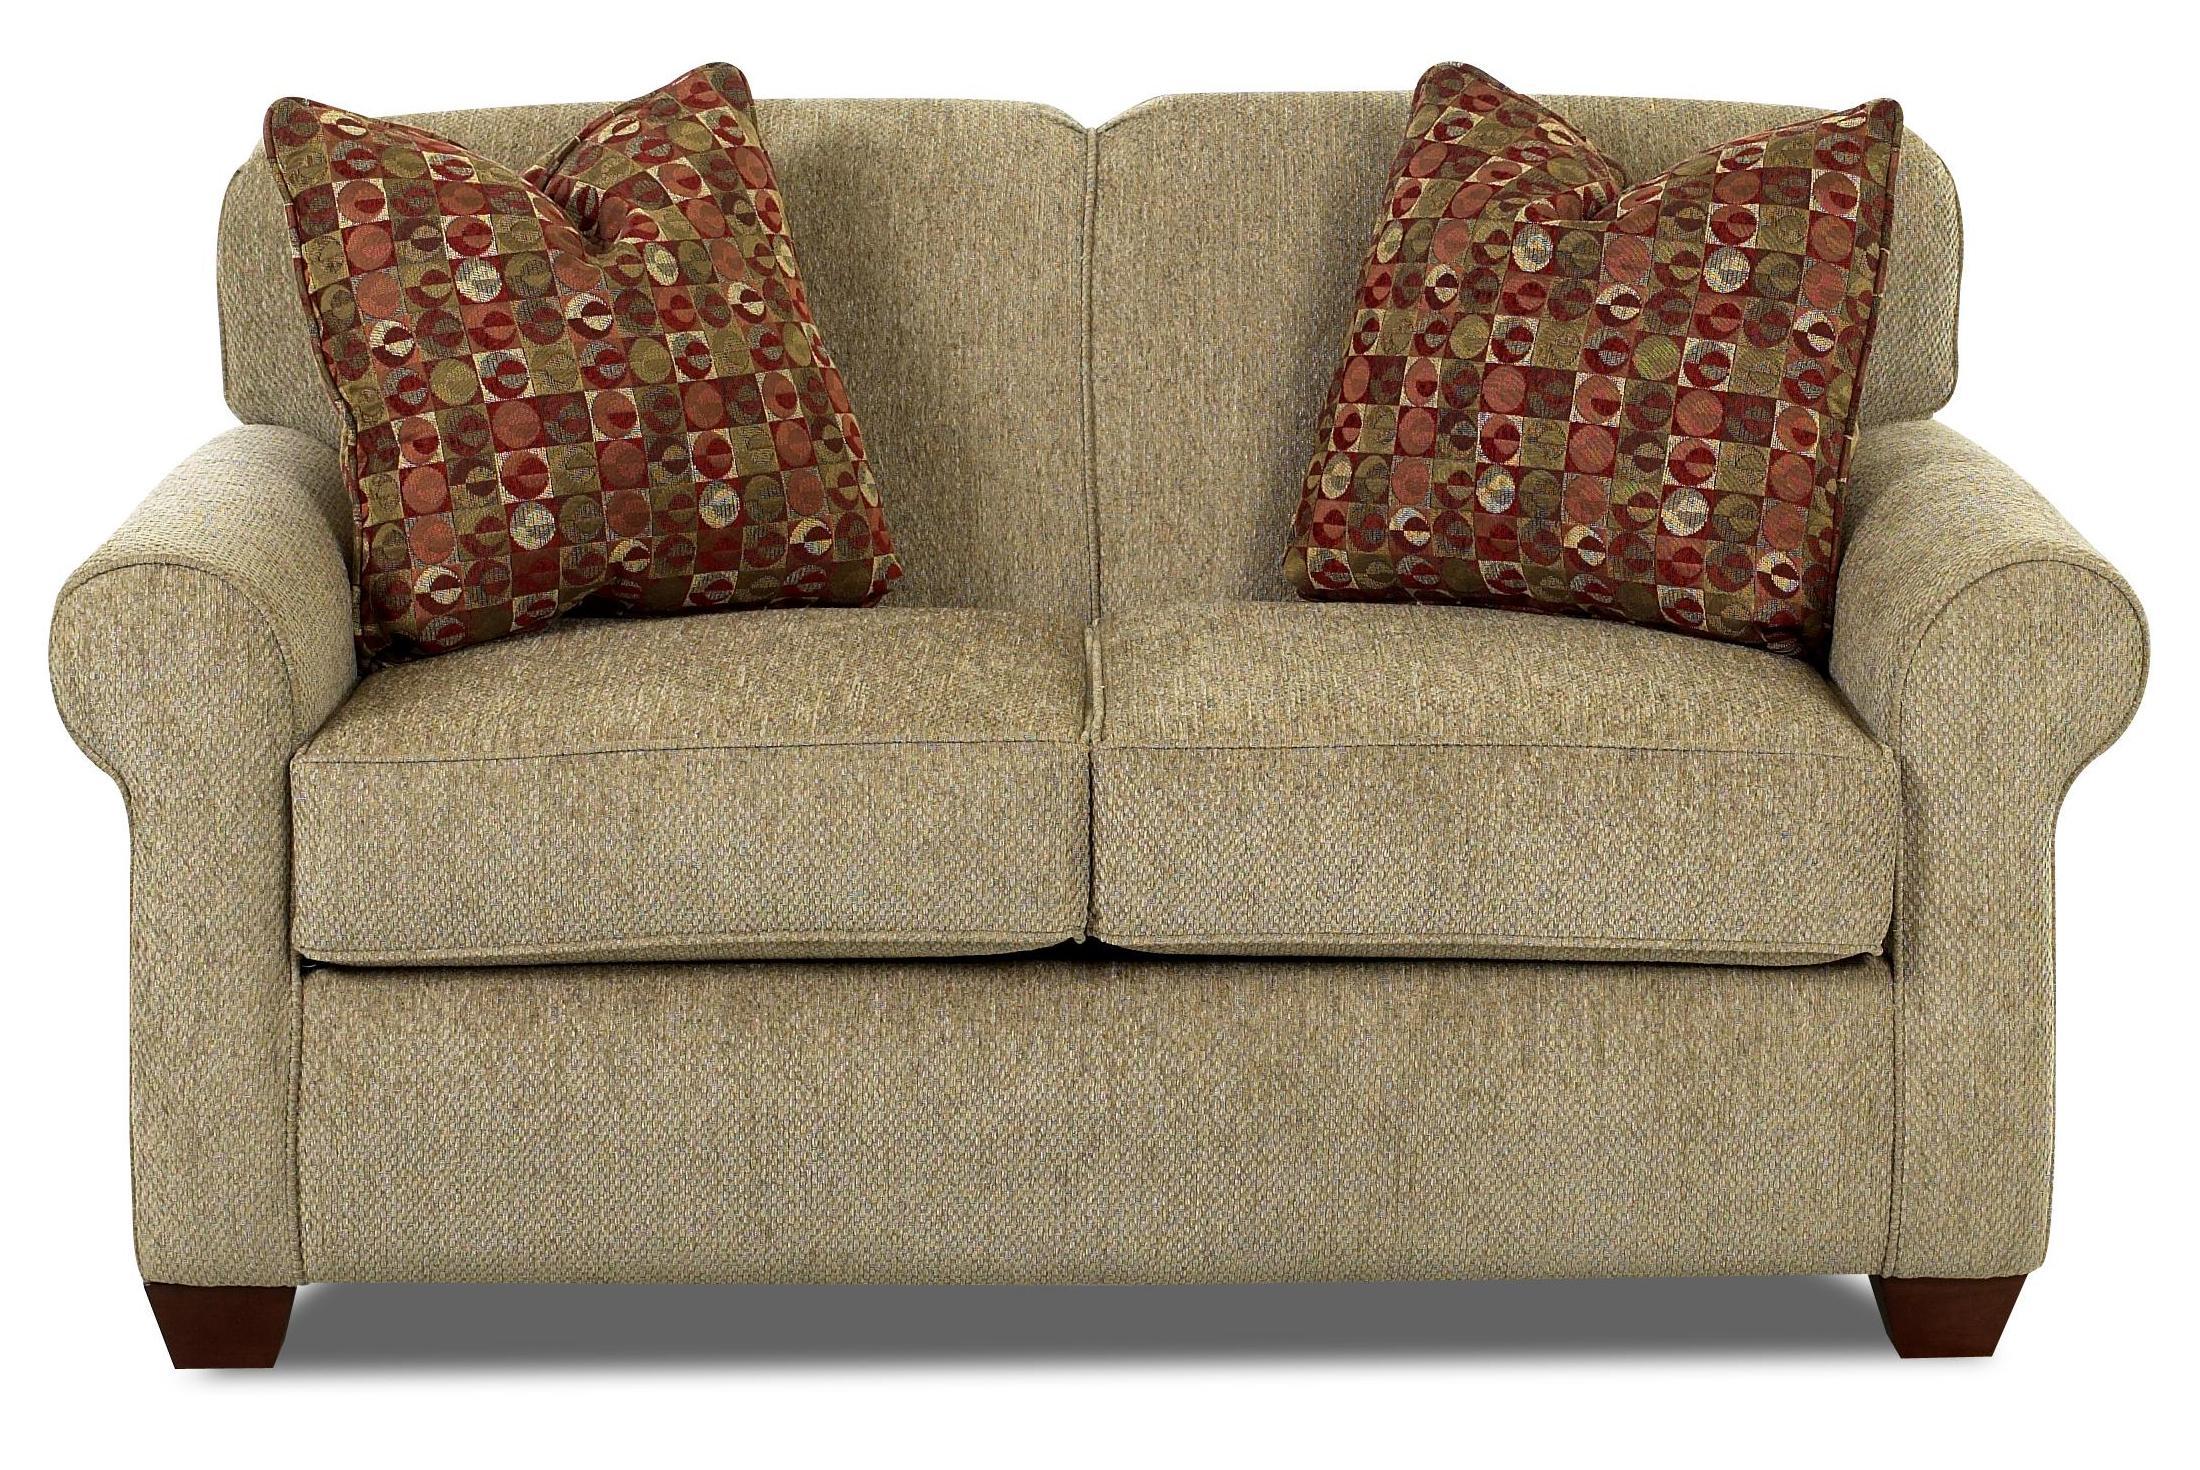 twin chair sleeper sofa ebay wing covers klaussner mayhew 97900 etsl oversized with enso memory foam mattress by